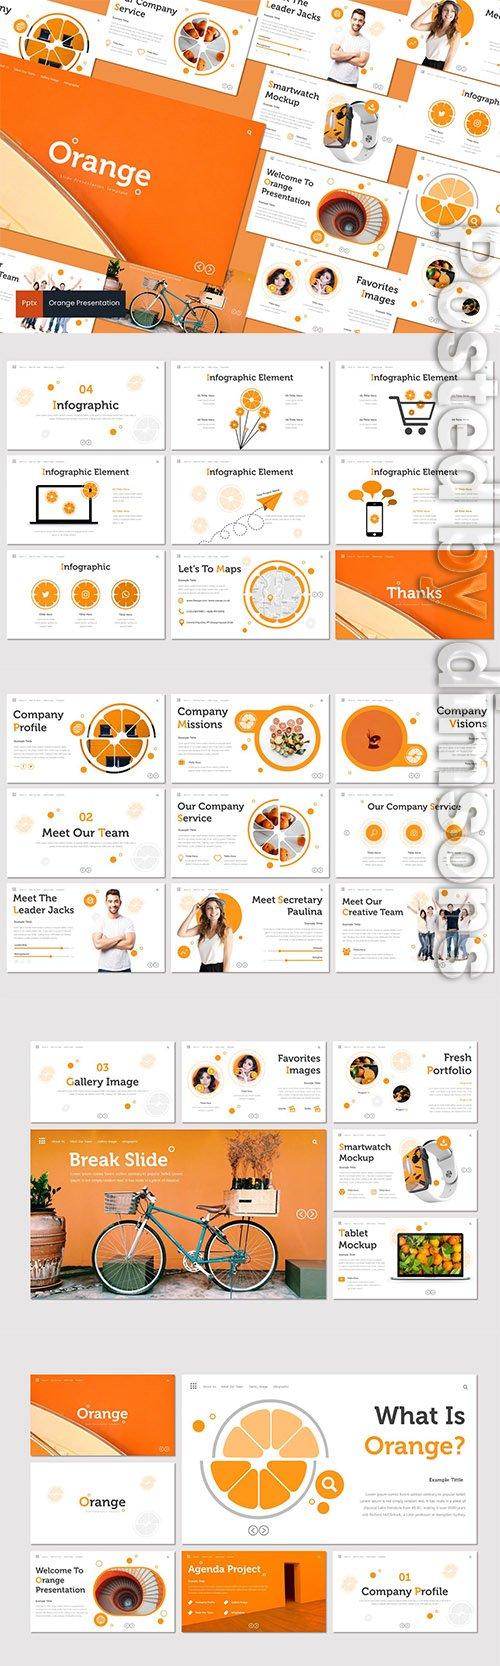 Orange - Powerpoint, Keynote and Google Slides Templates